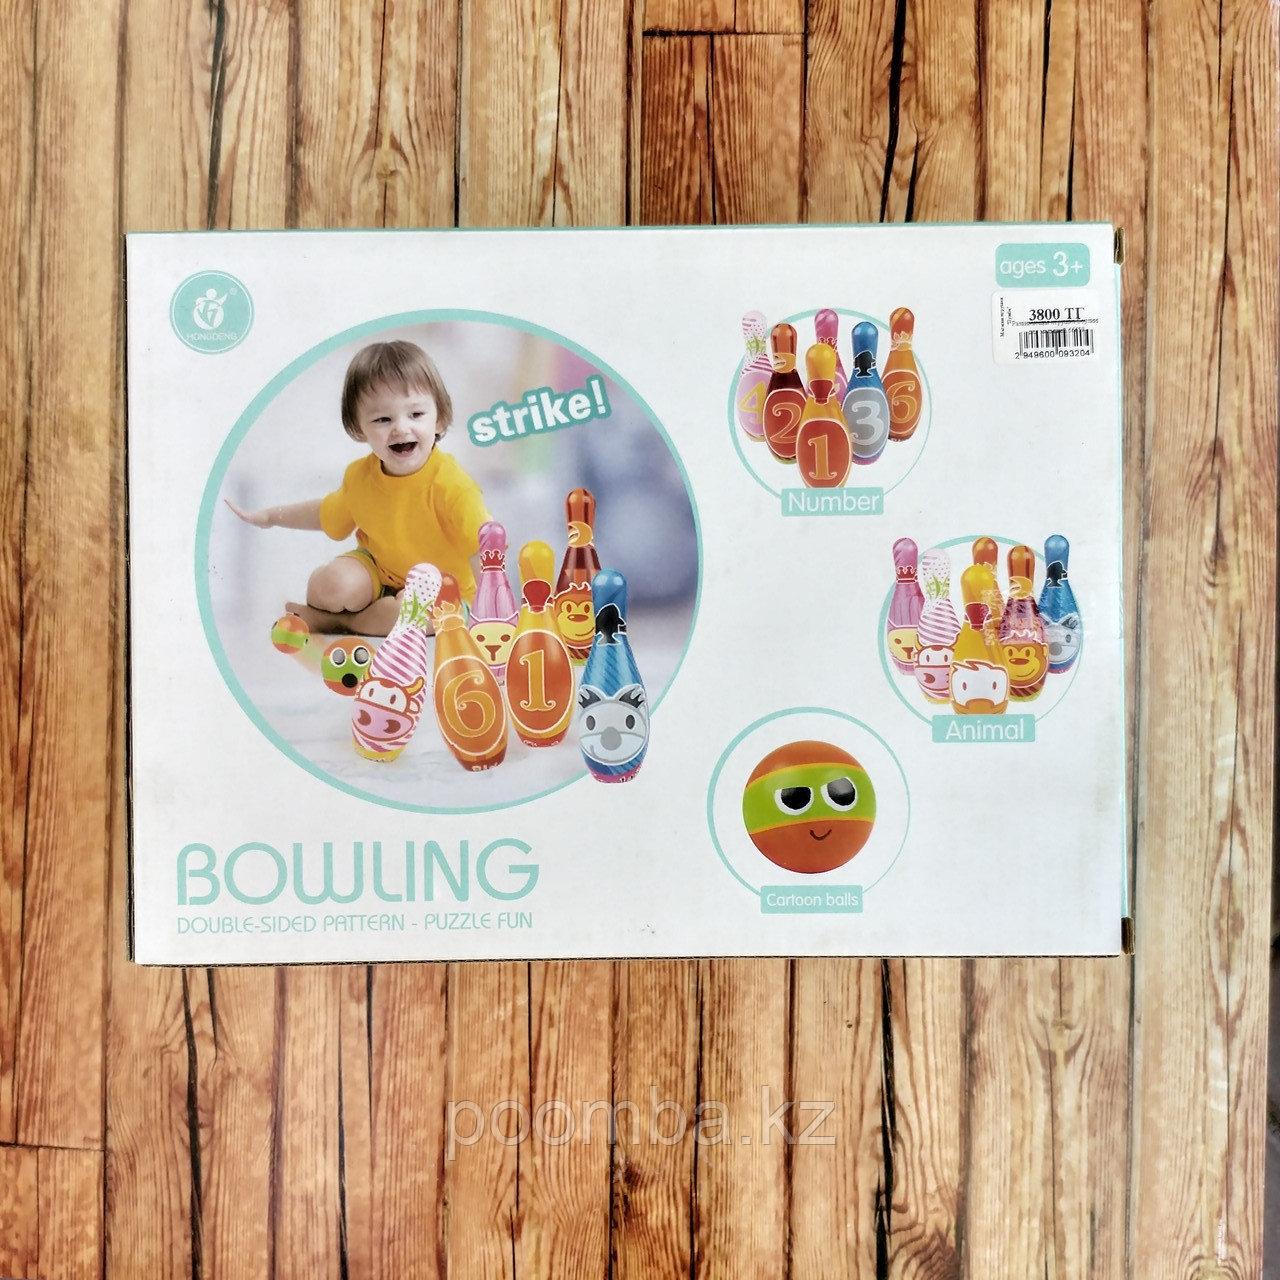 Детский Боулинг мягкий